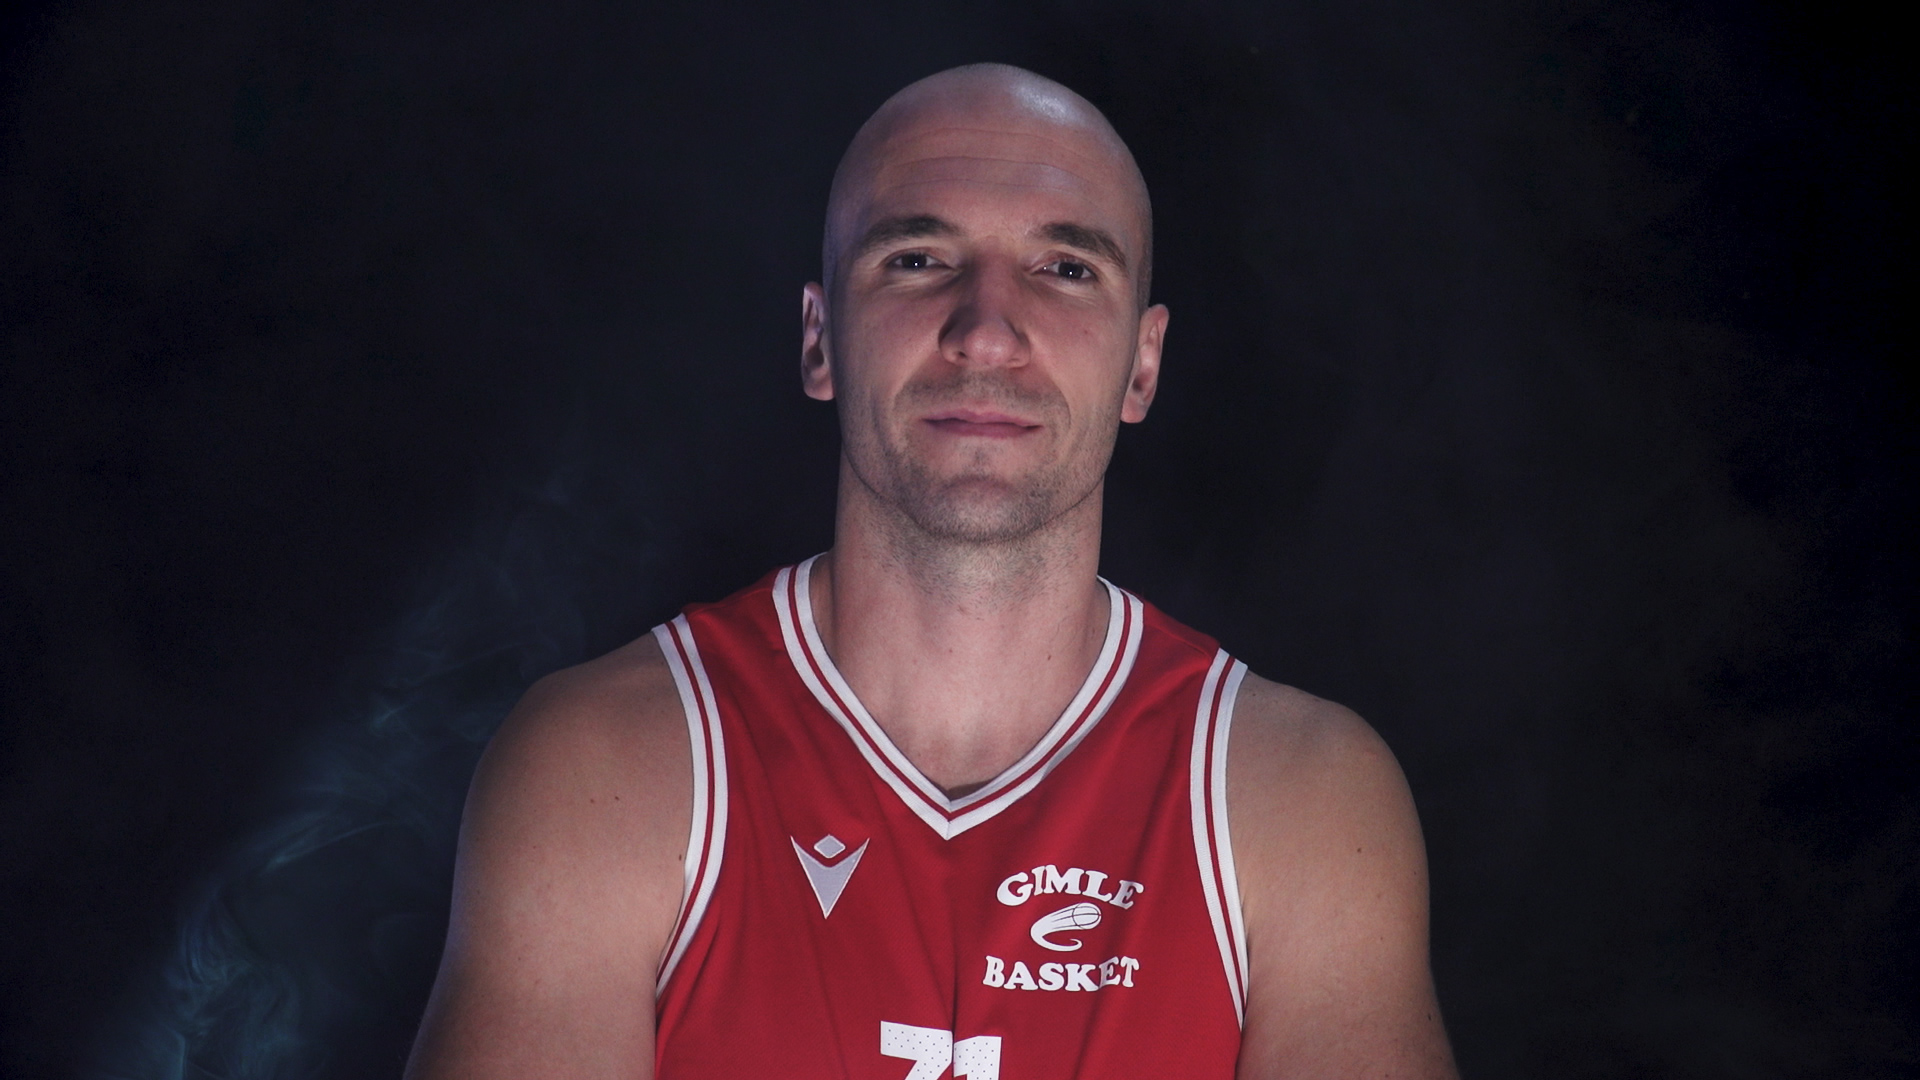 Milovan Savic